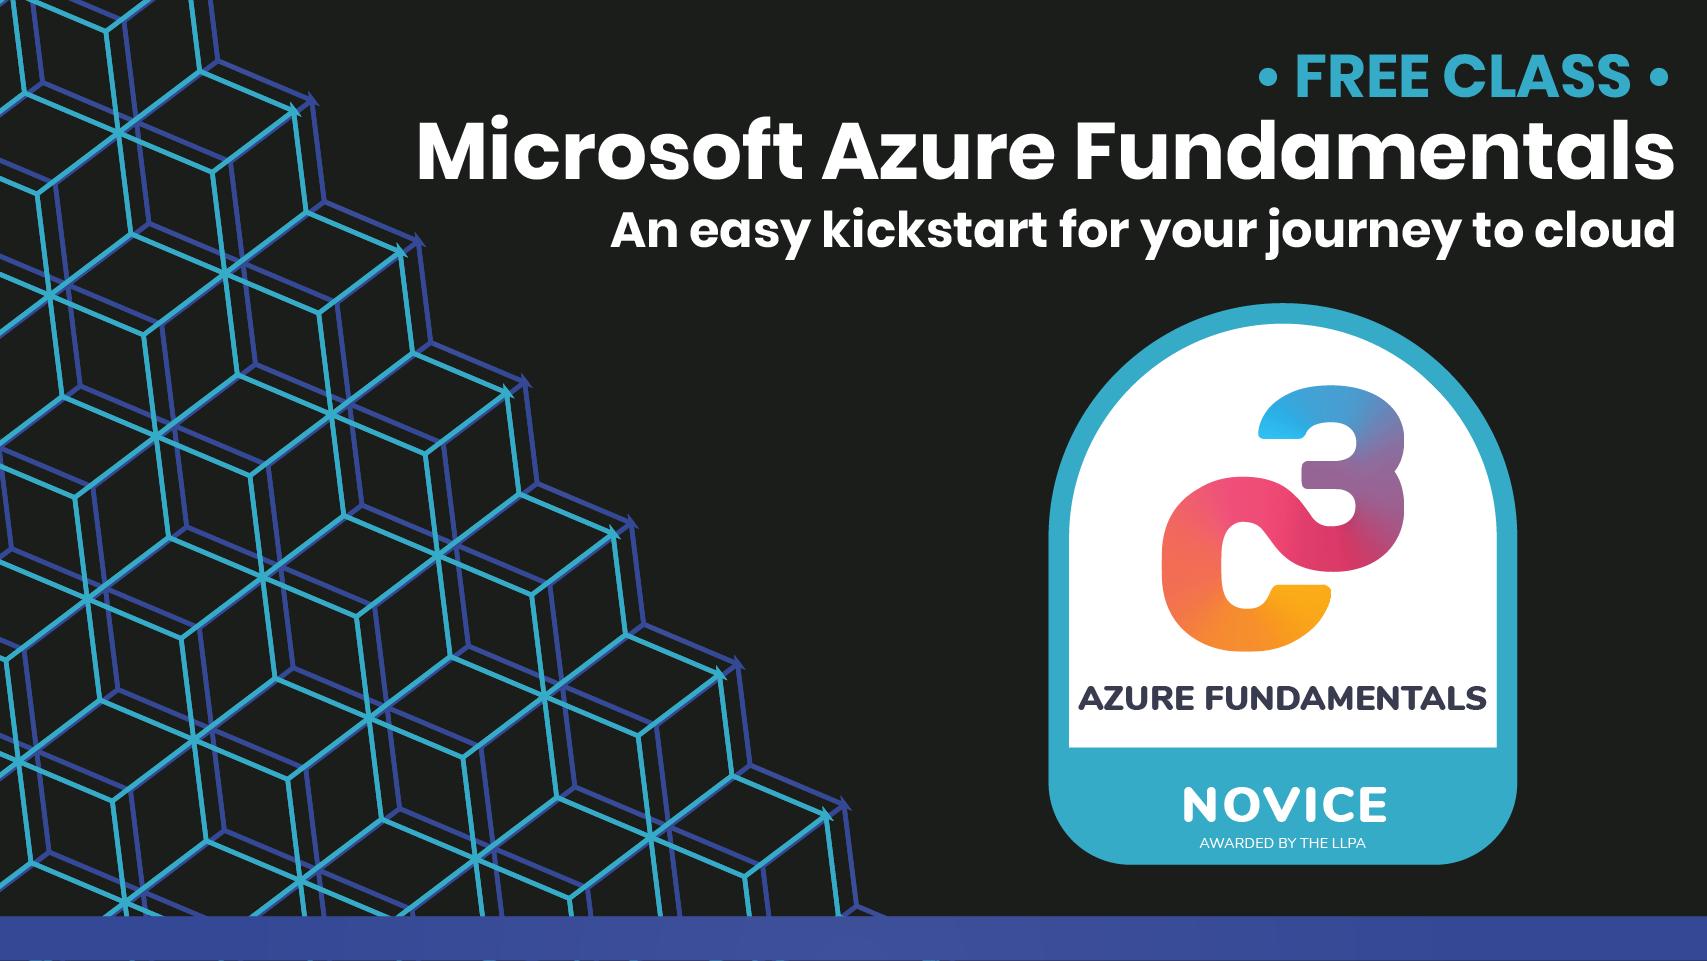 Free Microsoft Azure Fundamentals